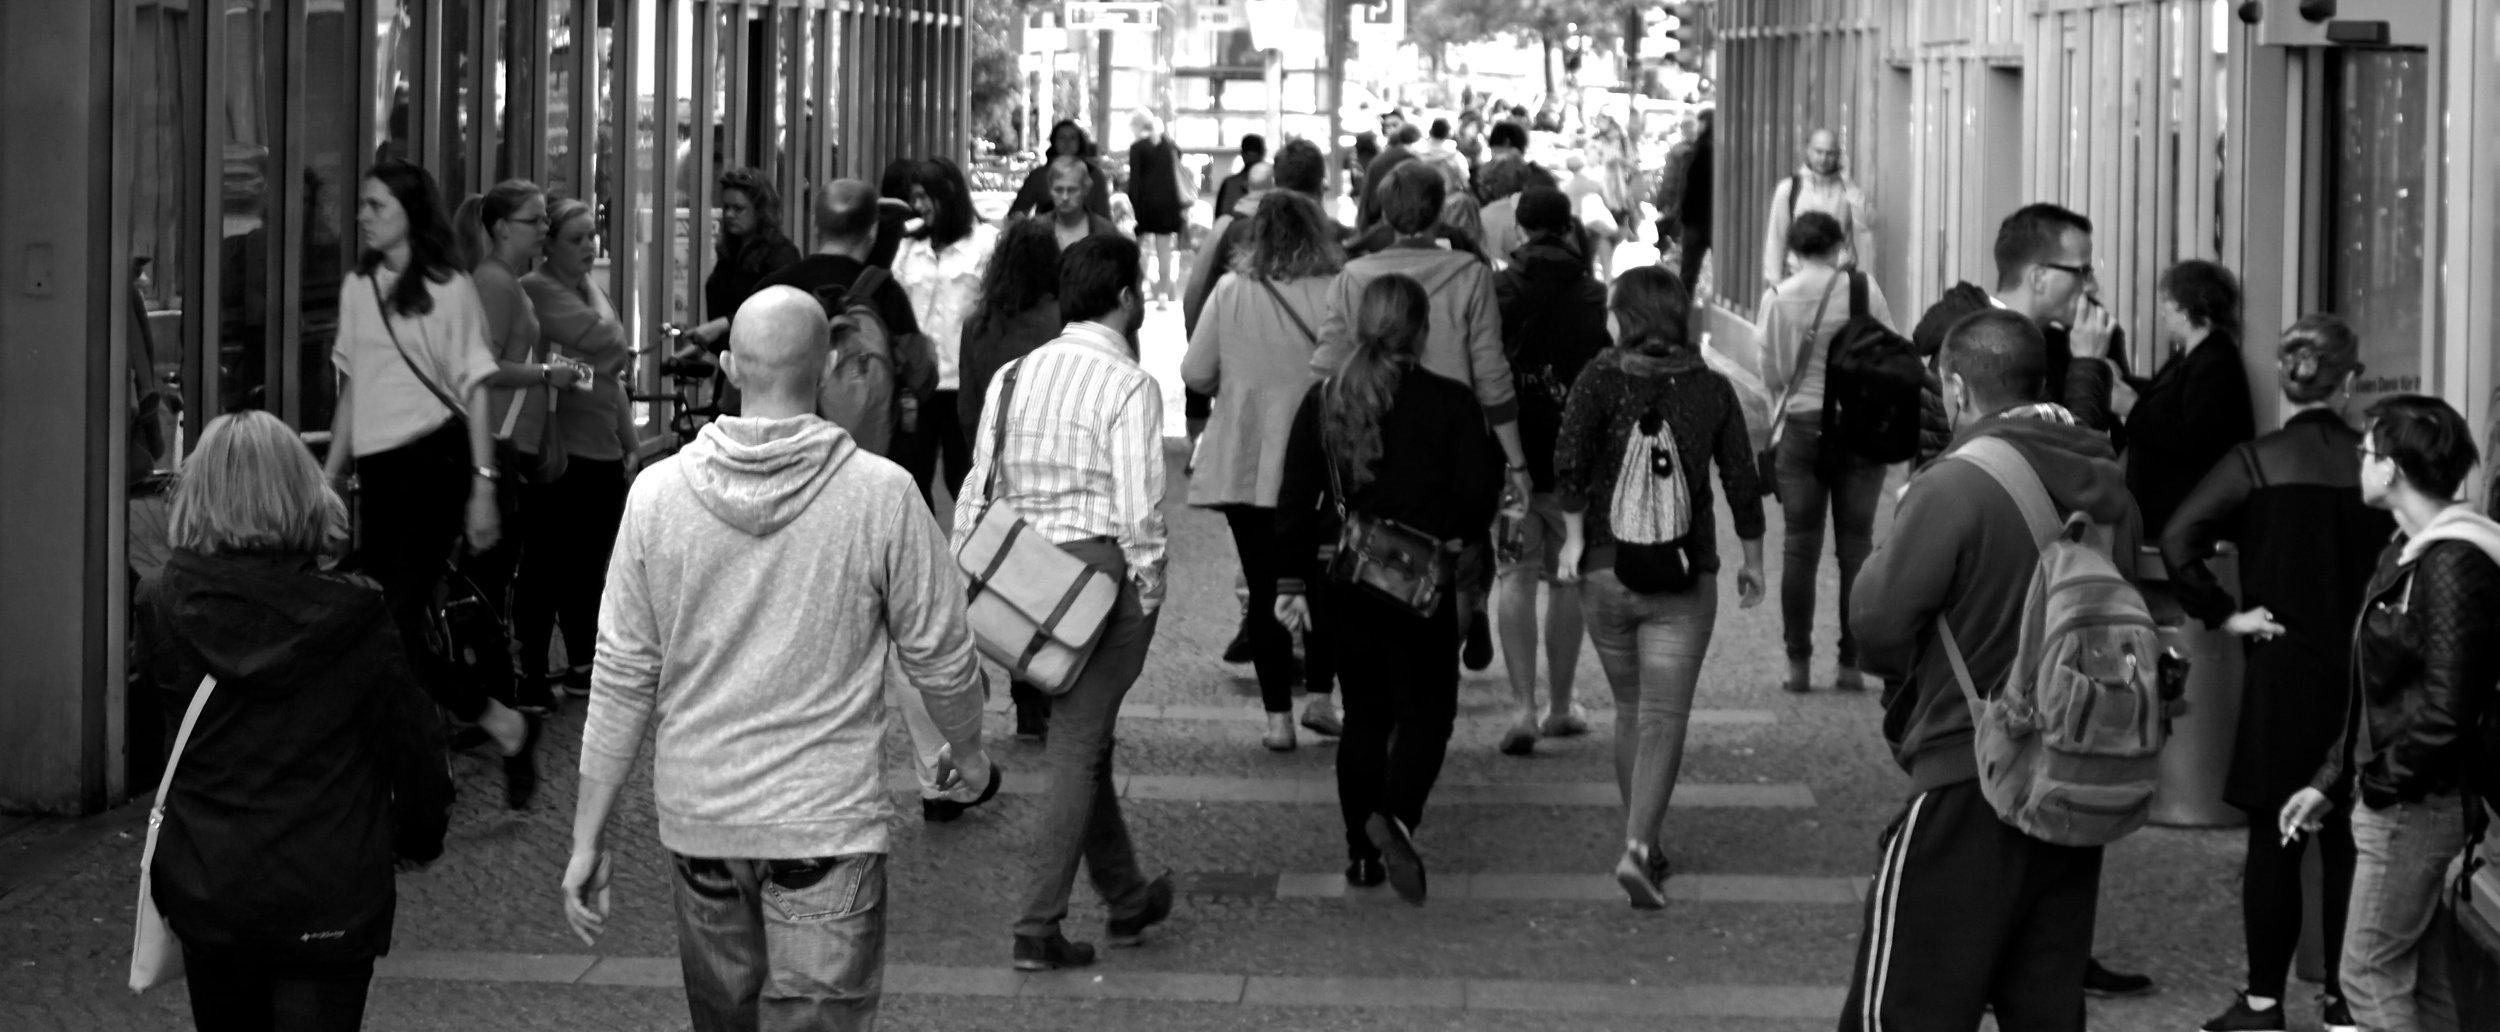 black-and-white-community-crowd-9816.jpg